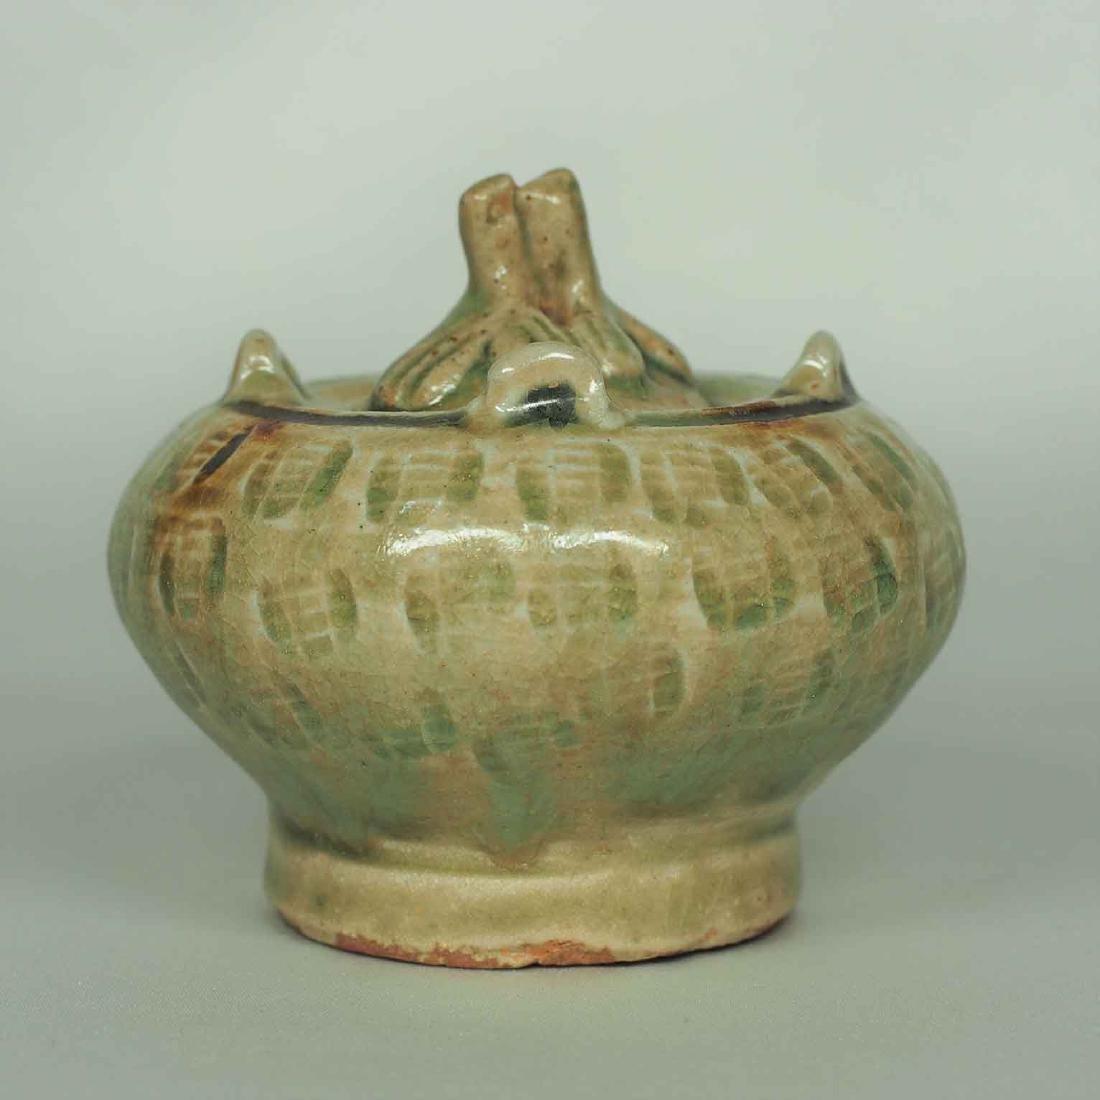 Lidded Water Pot with Brown Spot, Eastern Jin Dynasty